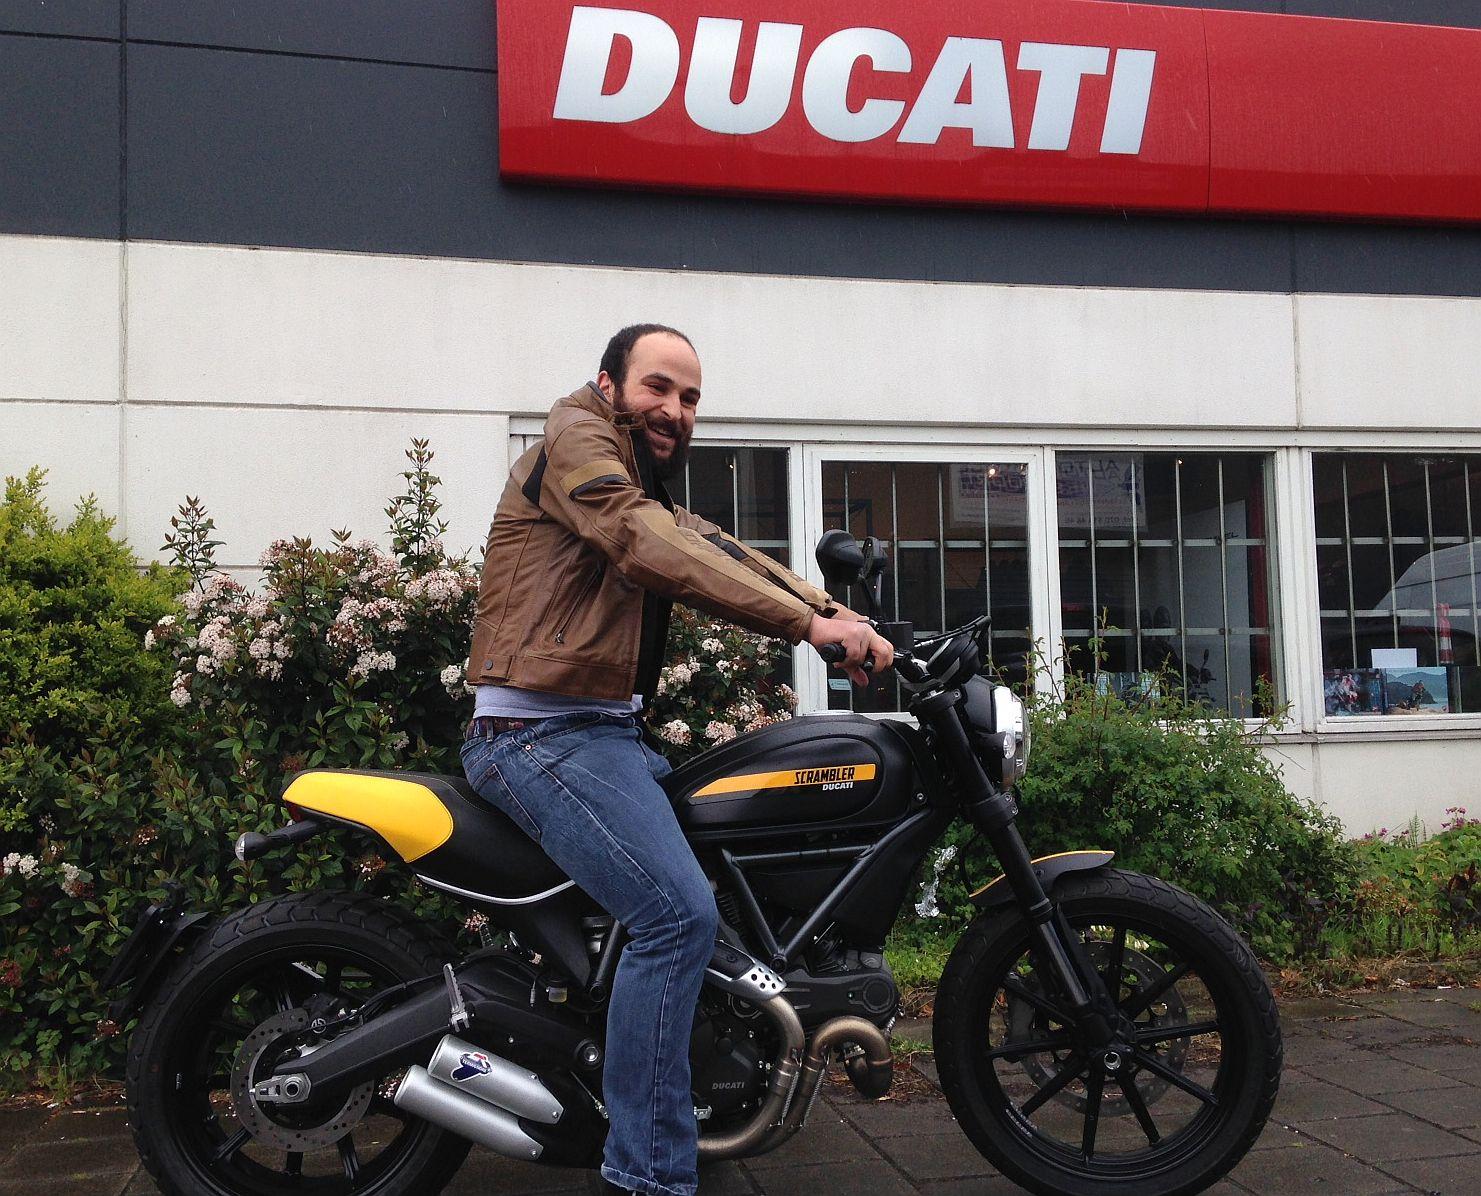 Ducati Dealer Amsterdam: Scrambler Full Throttle verkocht